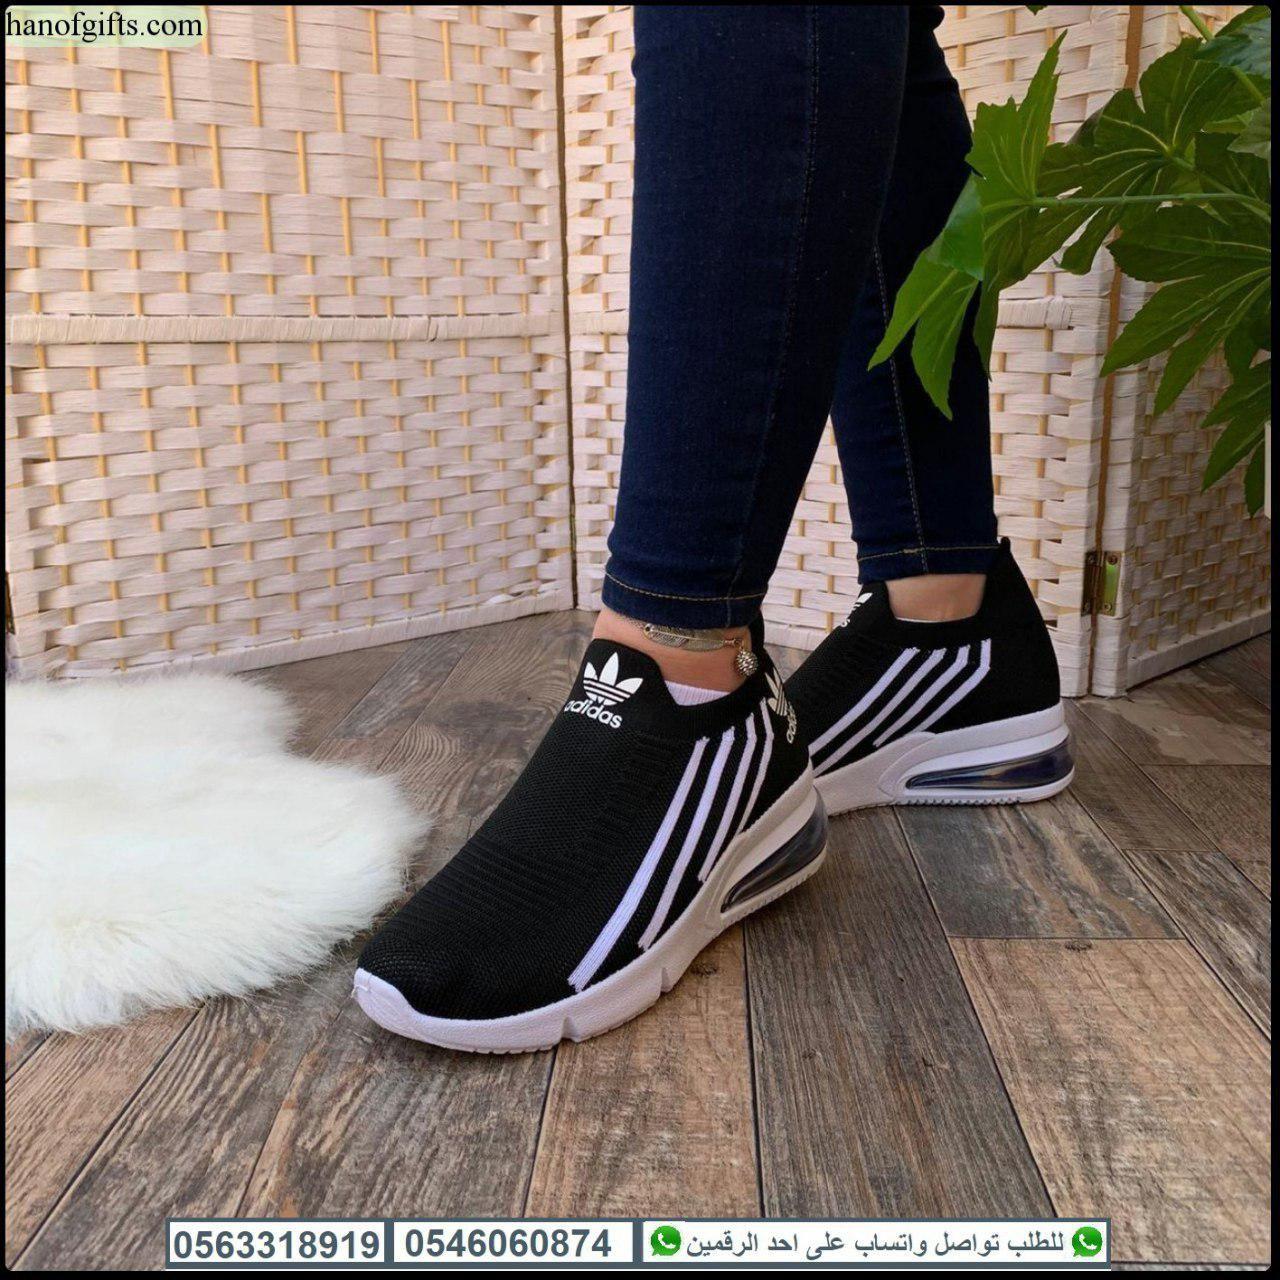 شوزات ماركات عالميه نسائيه فخمه و بمقاسات من 36 الى 41 هدايا هنوف Slip On Sneaker Vans Classic Slip On Sneaker Vans Classic Slip On